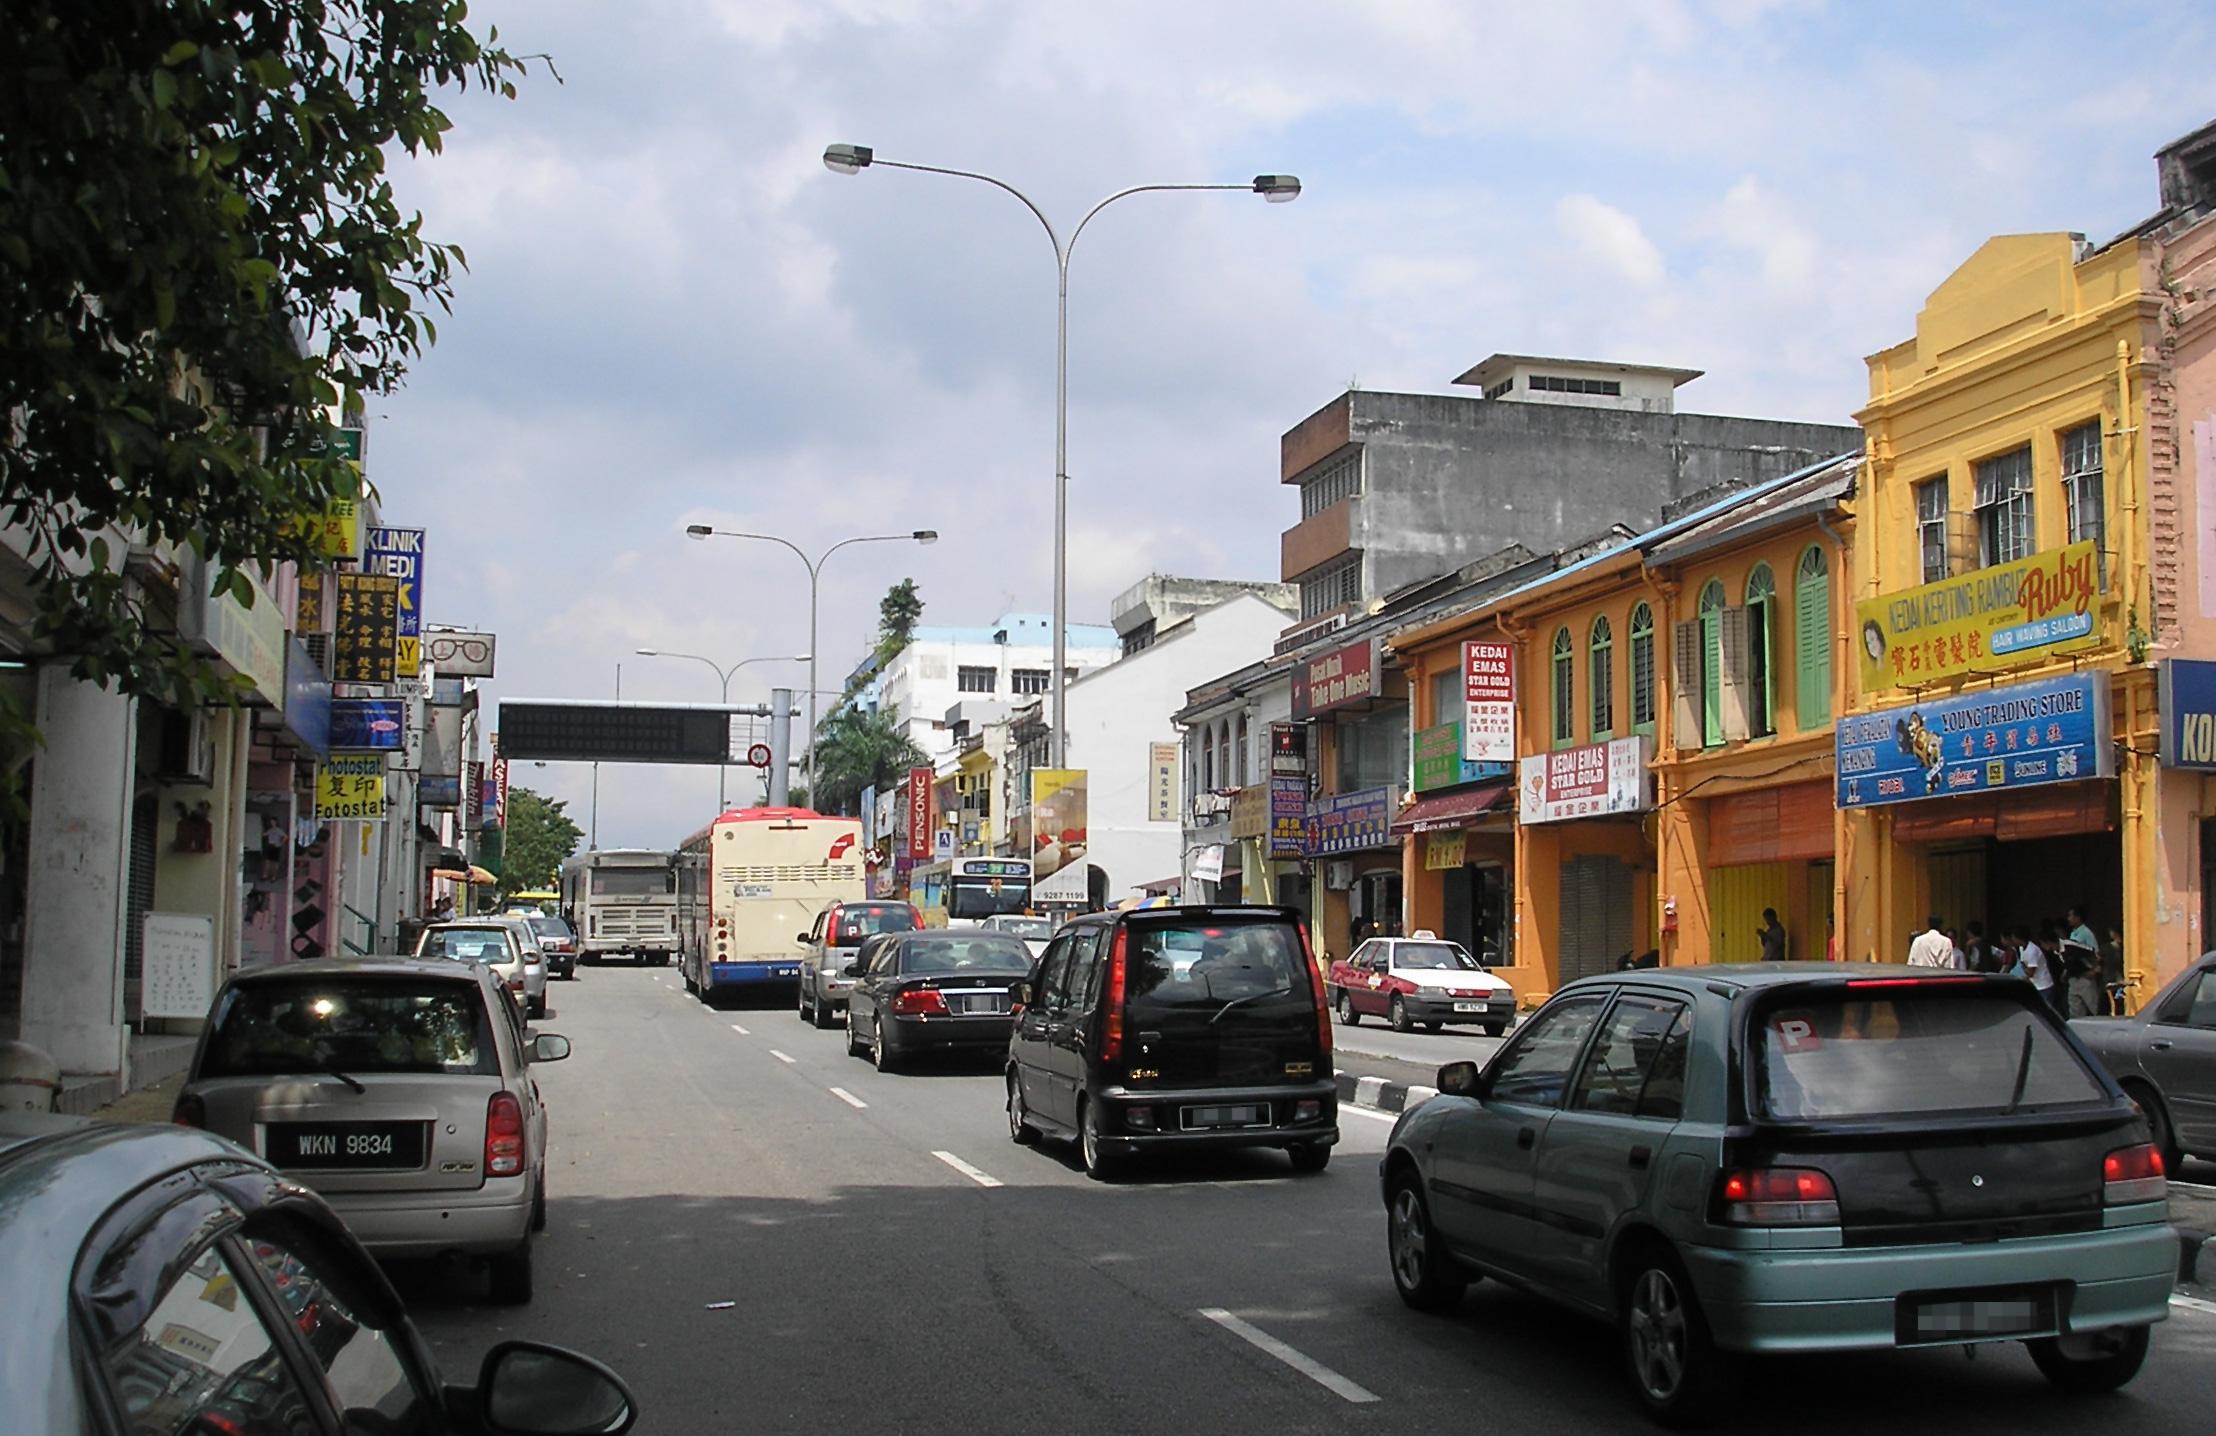 The main street (Jalan Pudu) of Pudu, Kuala Lu...